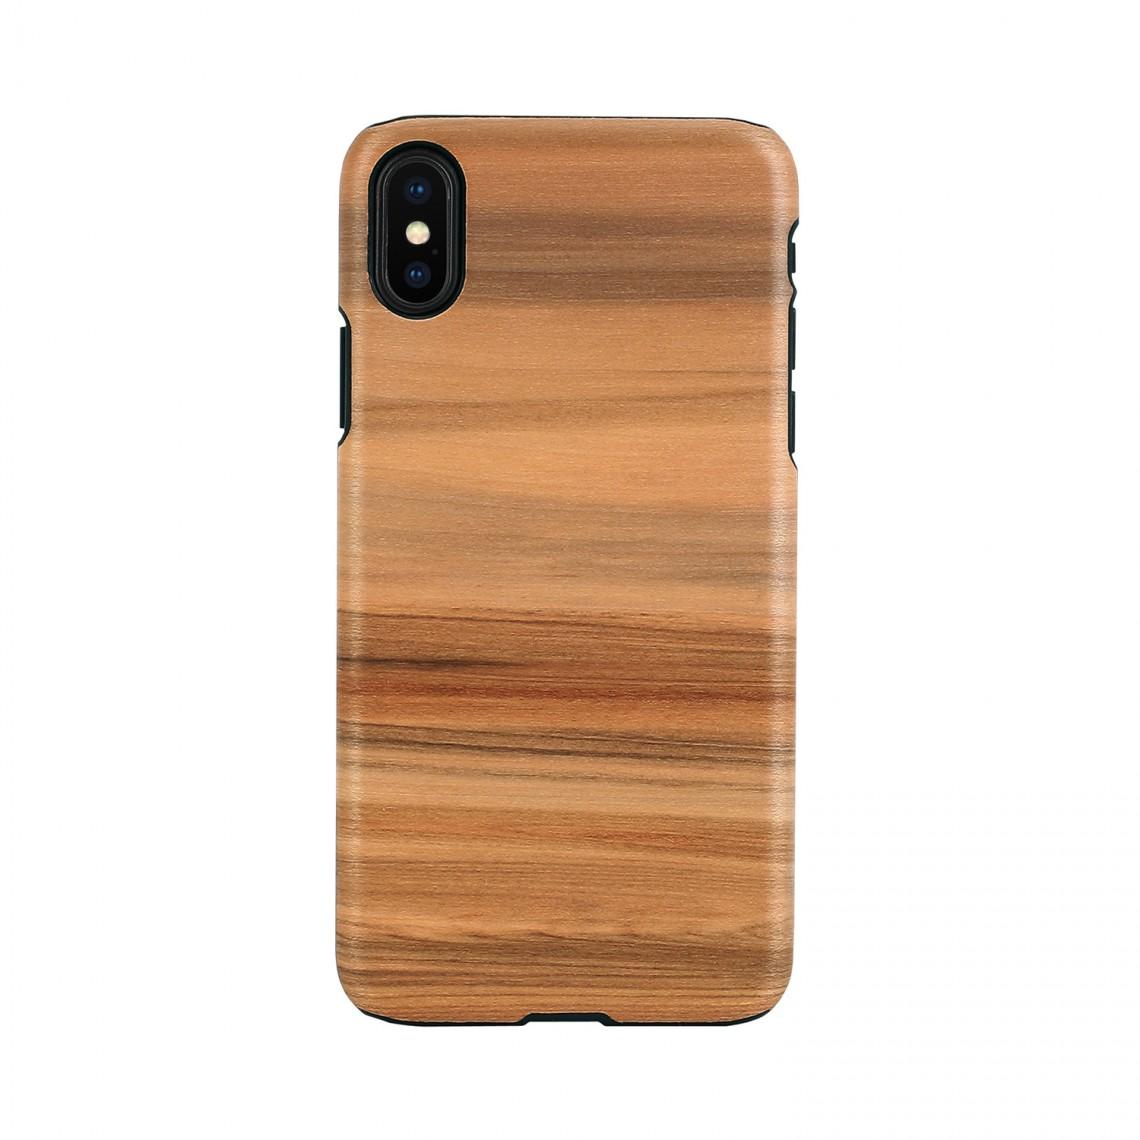 iPhone XR ケース 天然木 Man&Wood Cappuccino(マンアンドウッド カプチーノ)